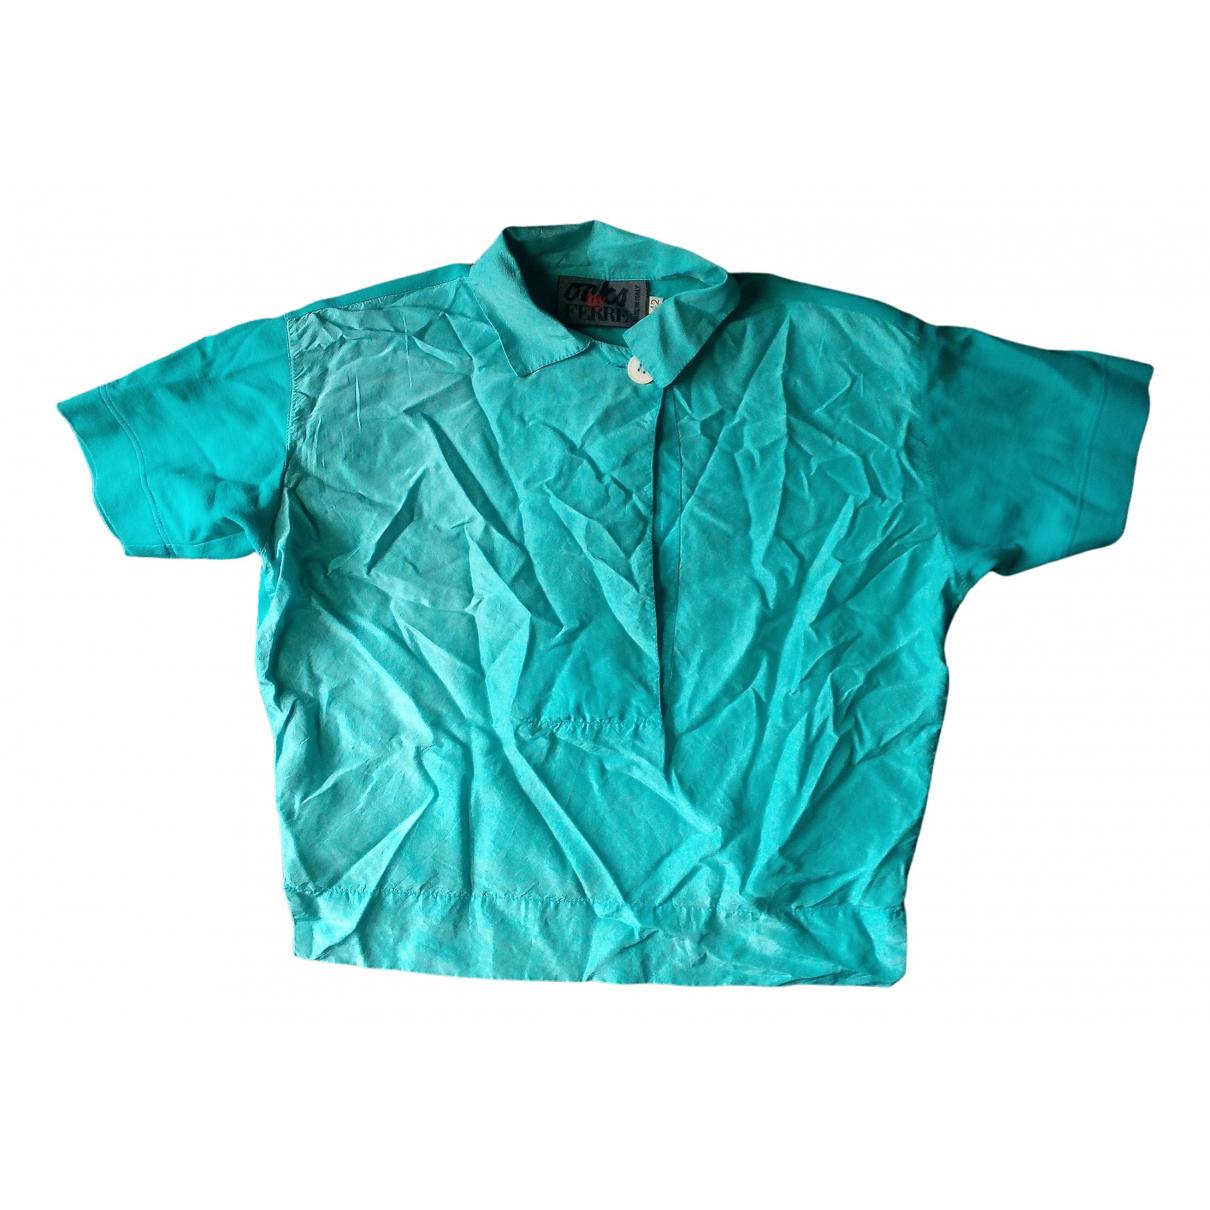 Gianfranco Ferré N Turquoise Silk  top for Women 42 IT